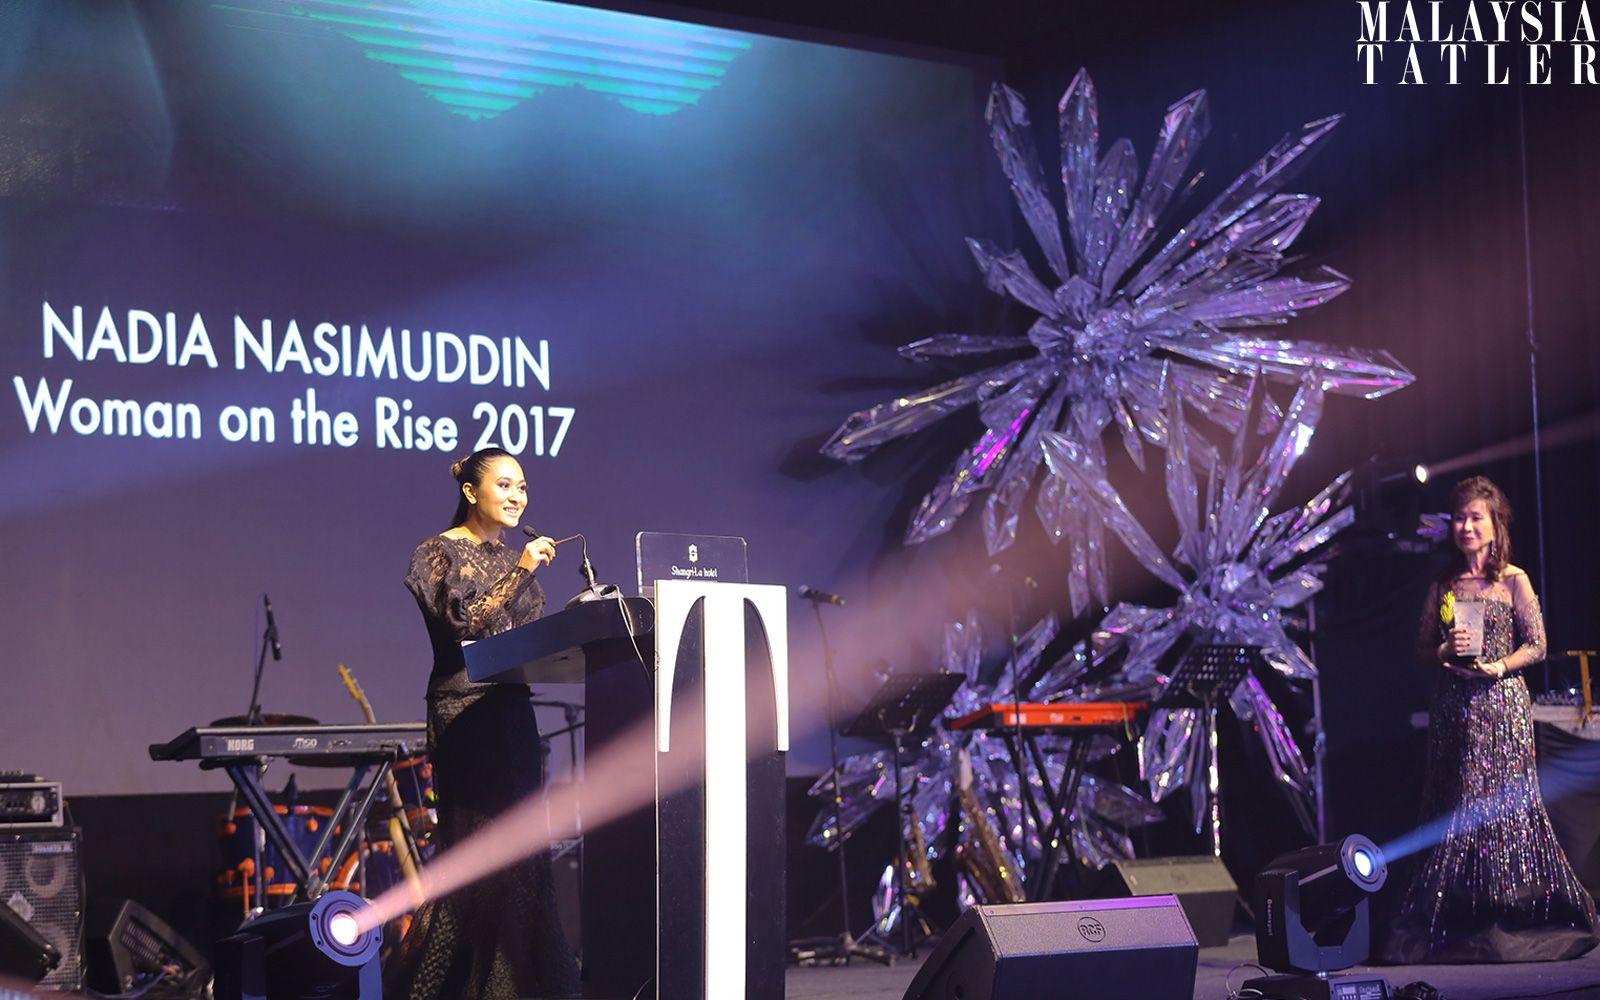 Nadia Nasimuddin accepting her award